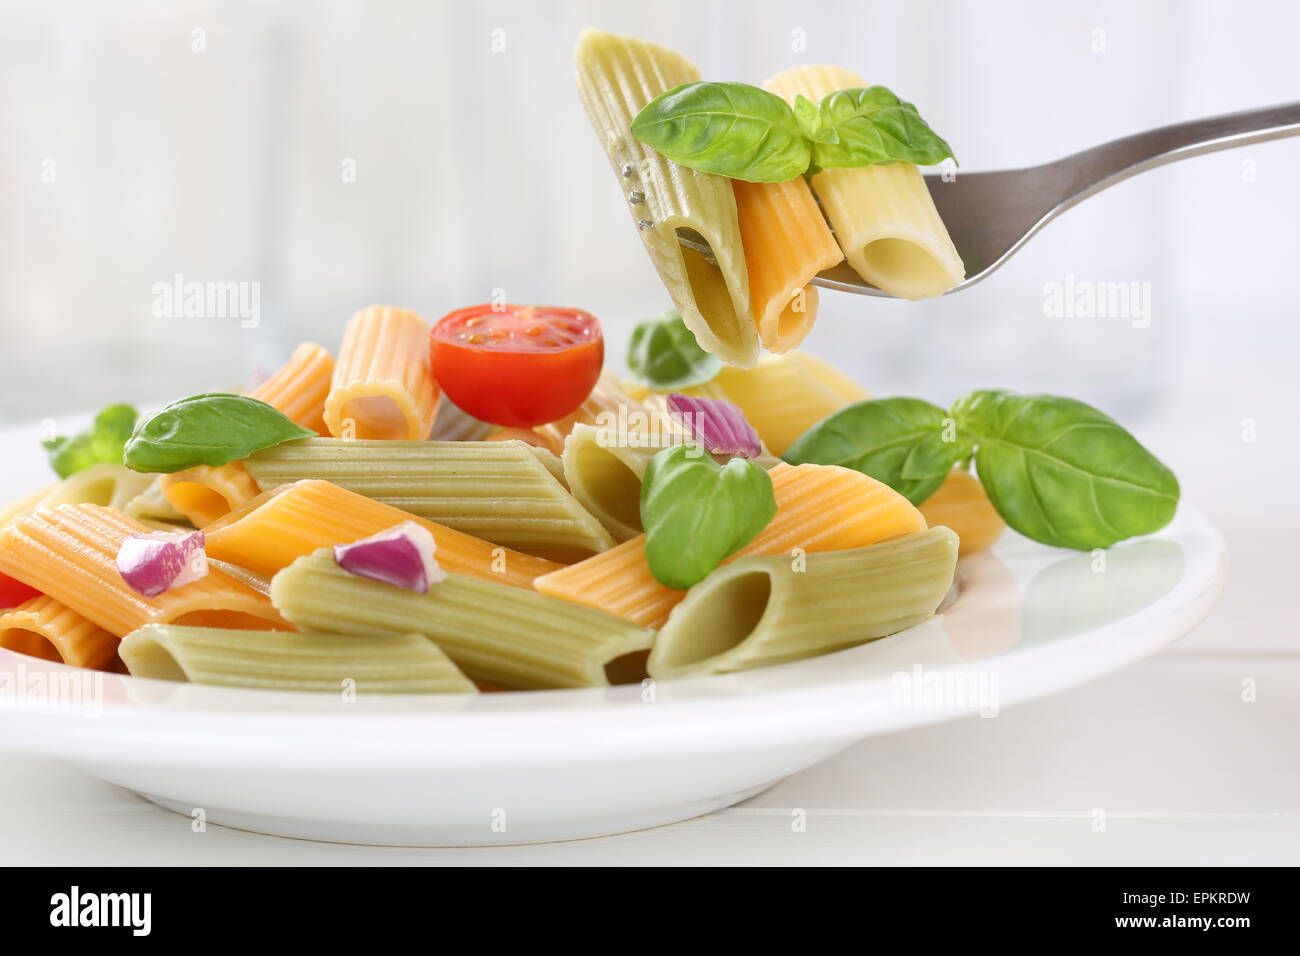 Bunte Penne Rigate Pasta Nudeln Gericht essen Immagini Stock